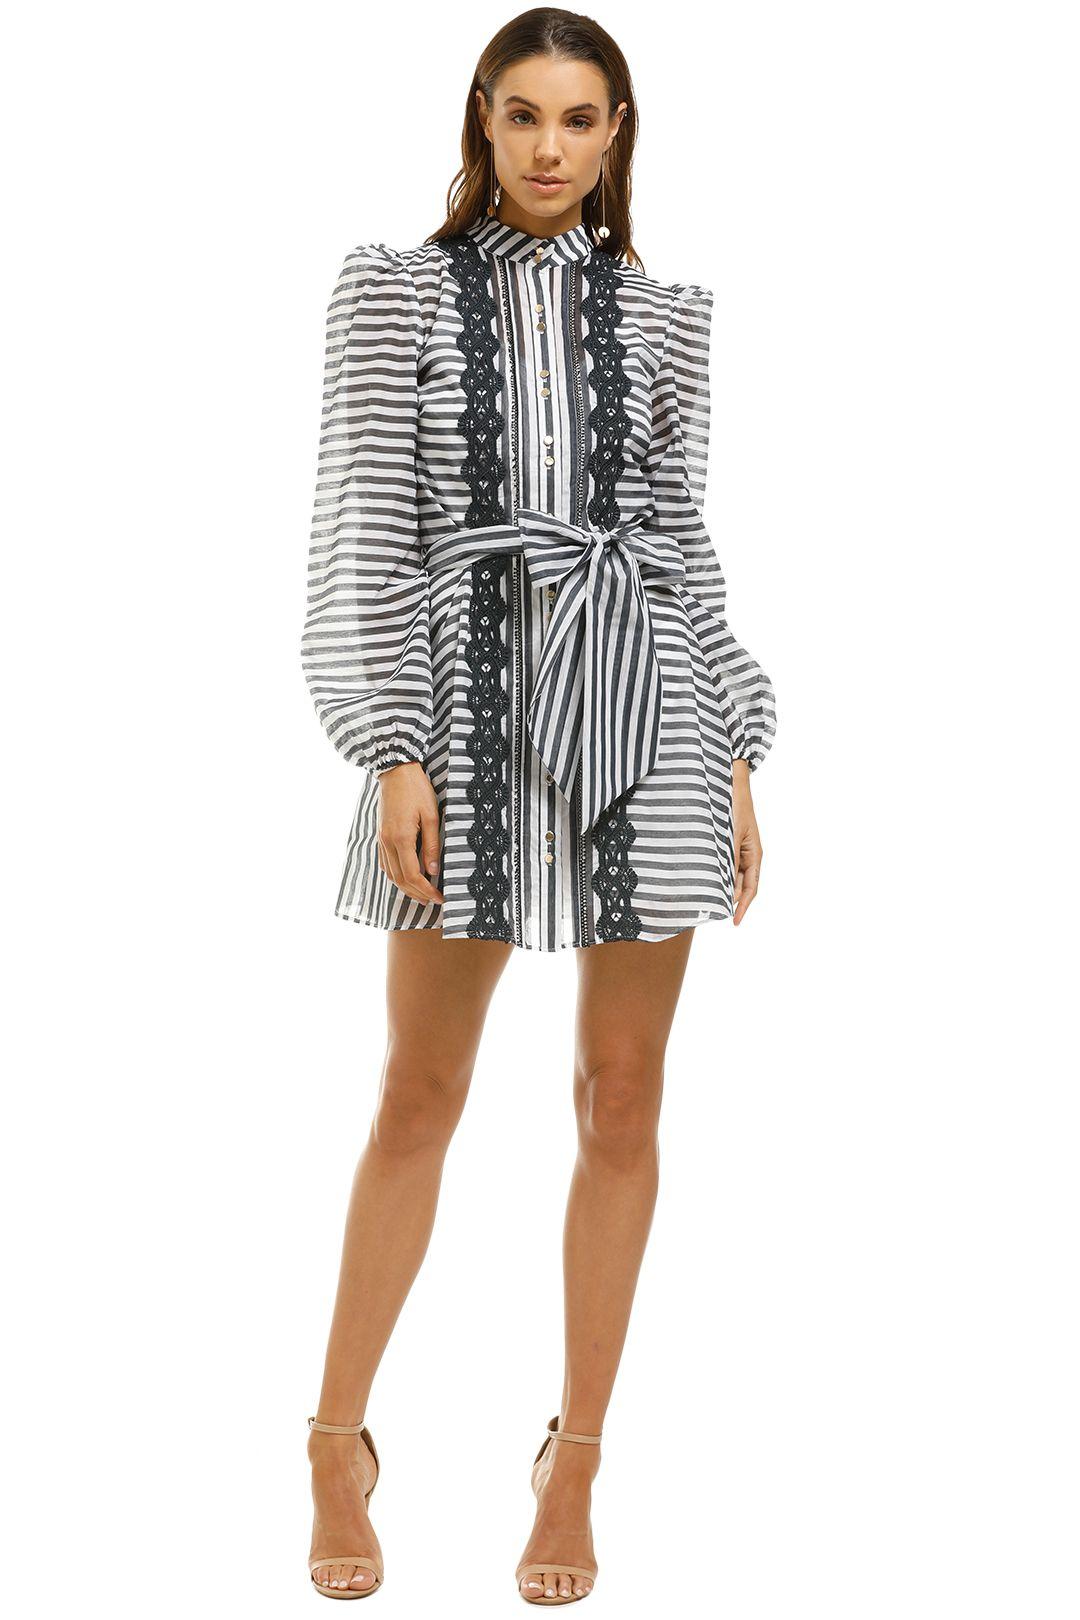 Keepsake-The-Label-Guardian-LS-Mini-Dress-Navy-Stripe-Front